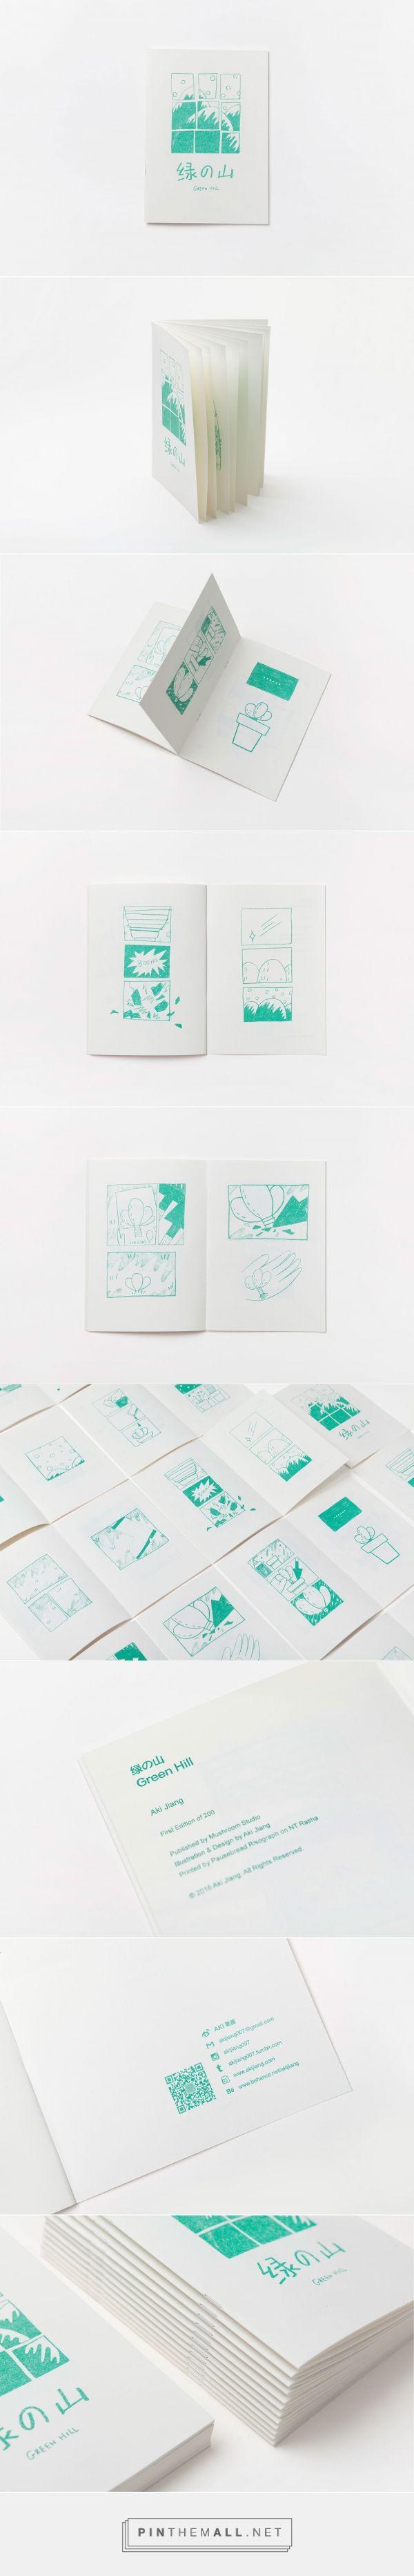 Self-Publishing Zine-Green Hill /自出版Zine《绿の山》 on Behance - created via https://pinthemall.net